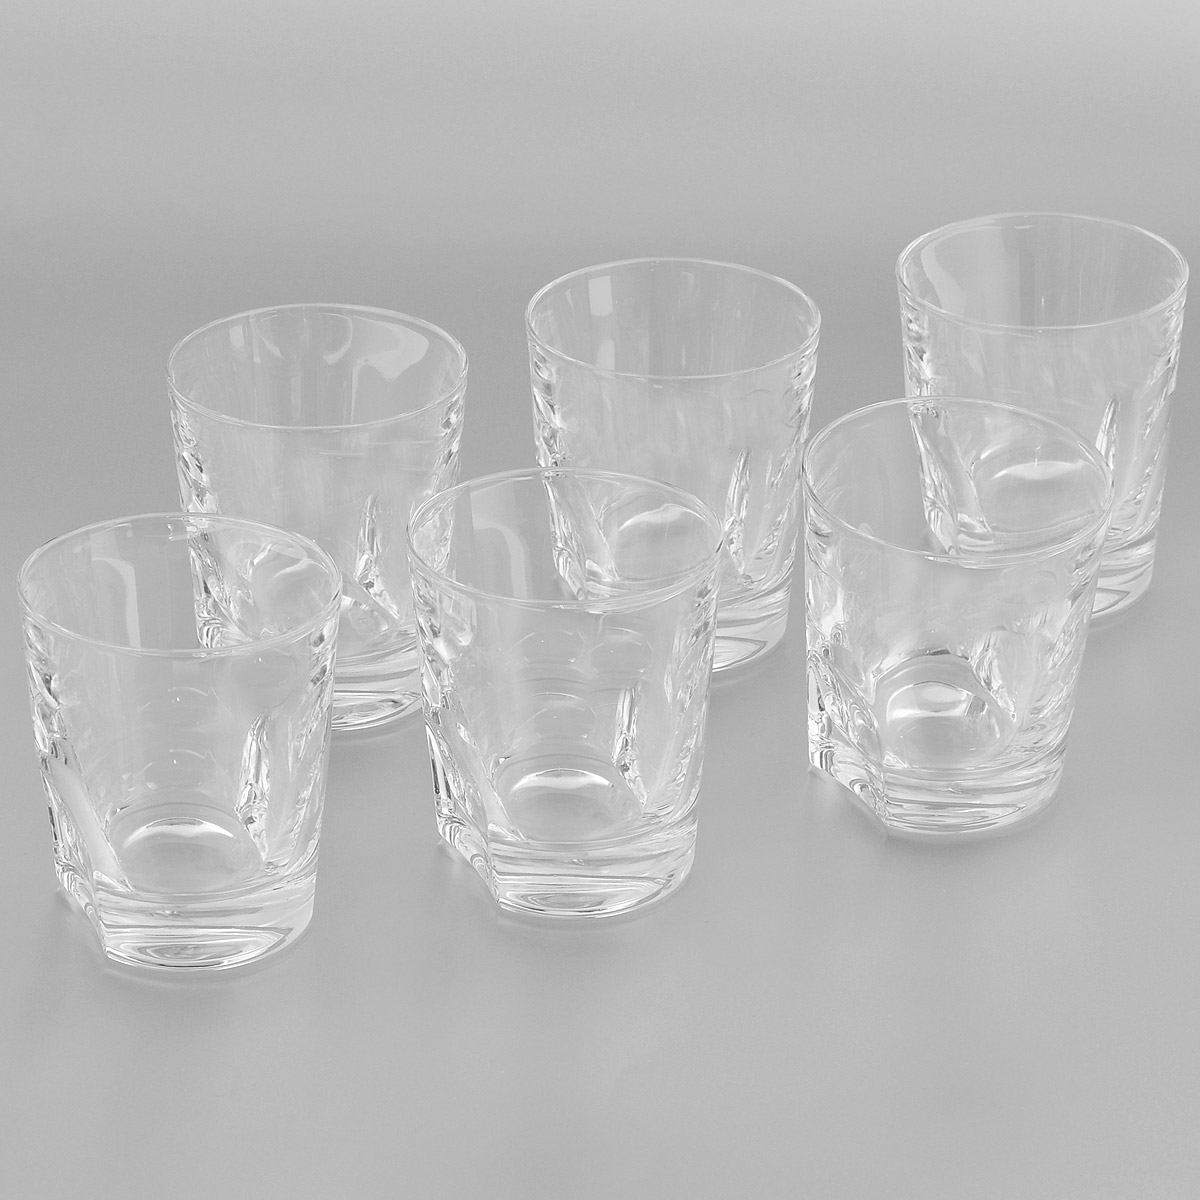 Набор стаканов Crystal Bohemia, 300 мл, 6 шт набор стаканов 6шт 300 мл